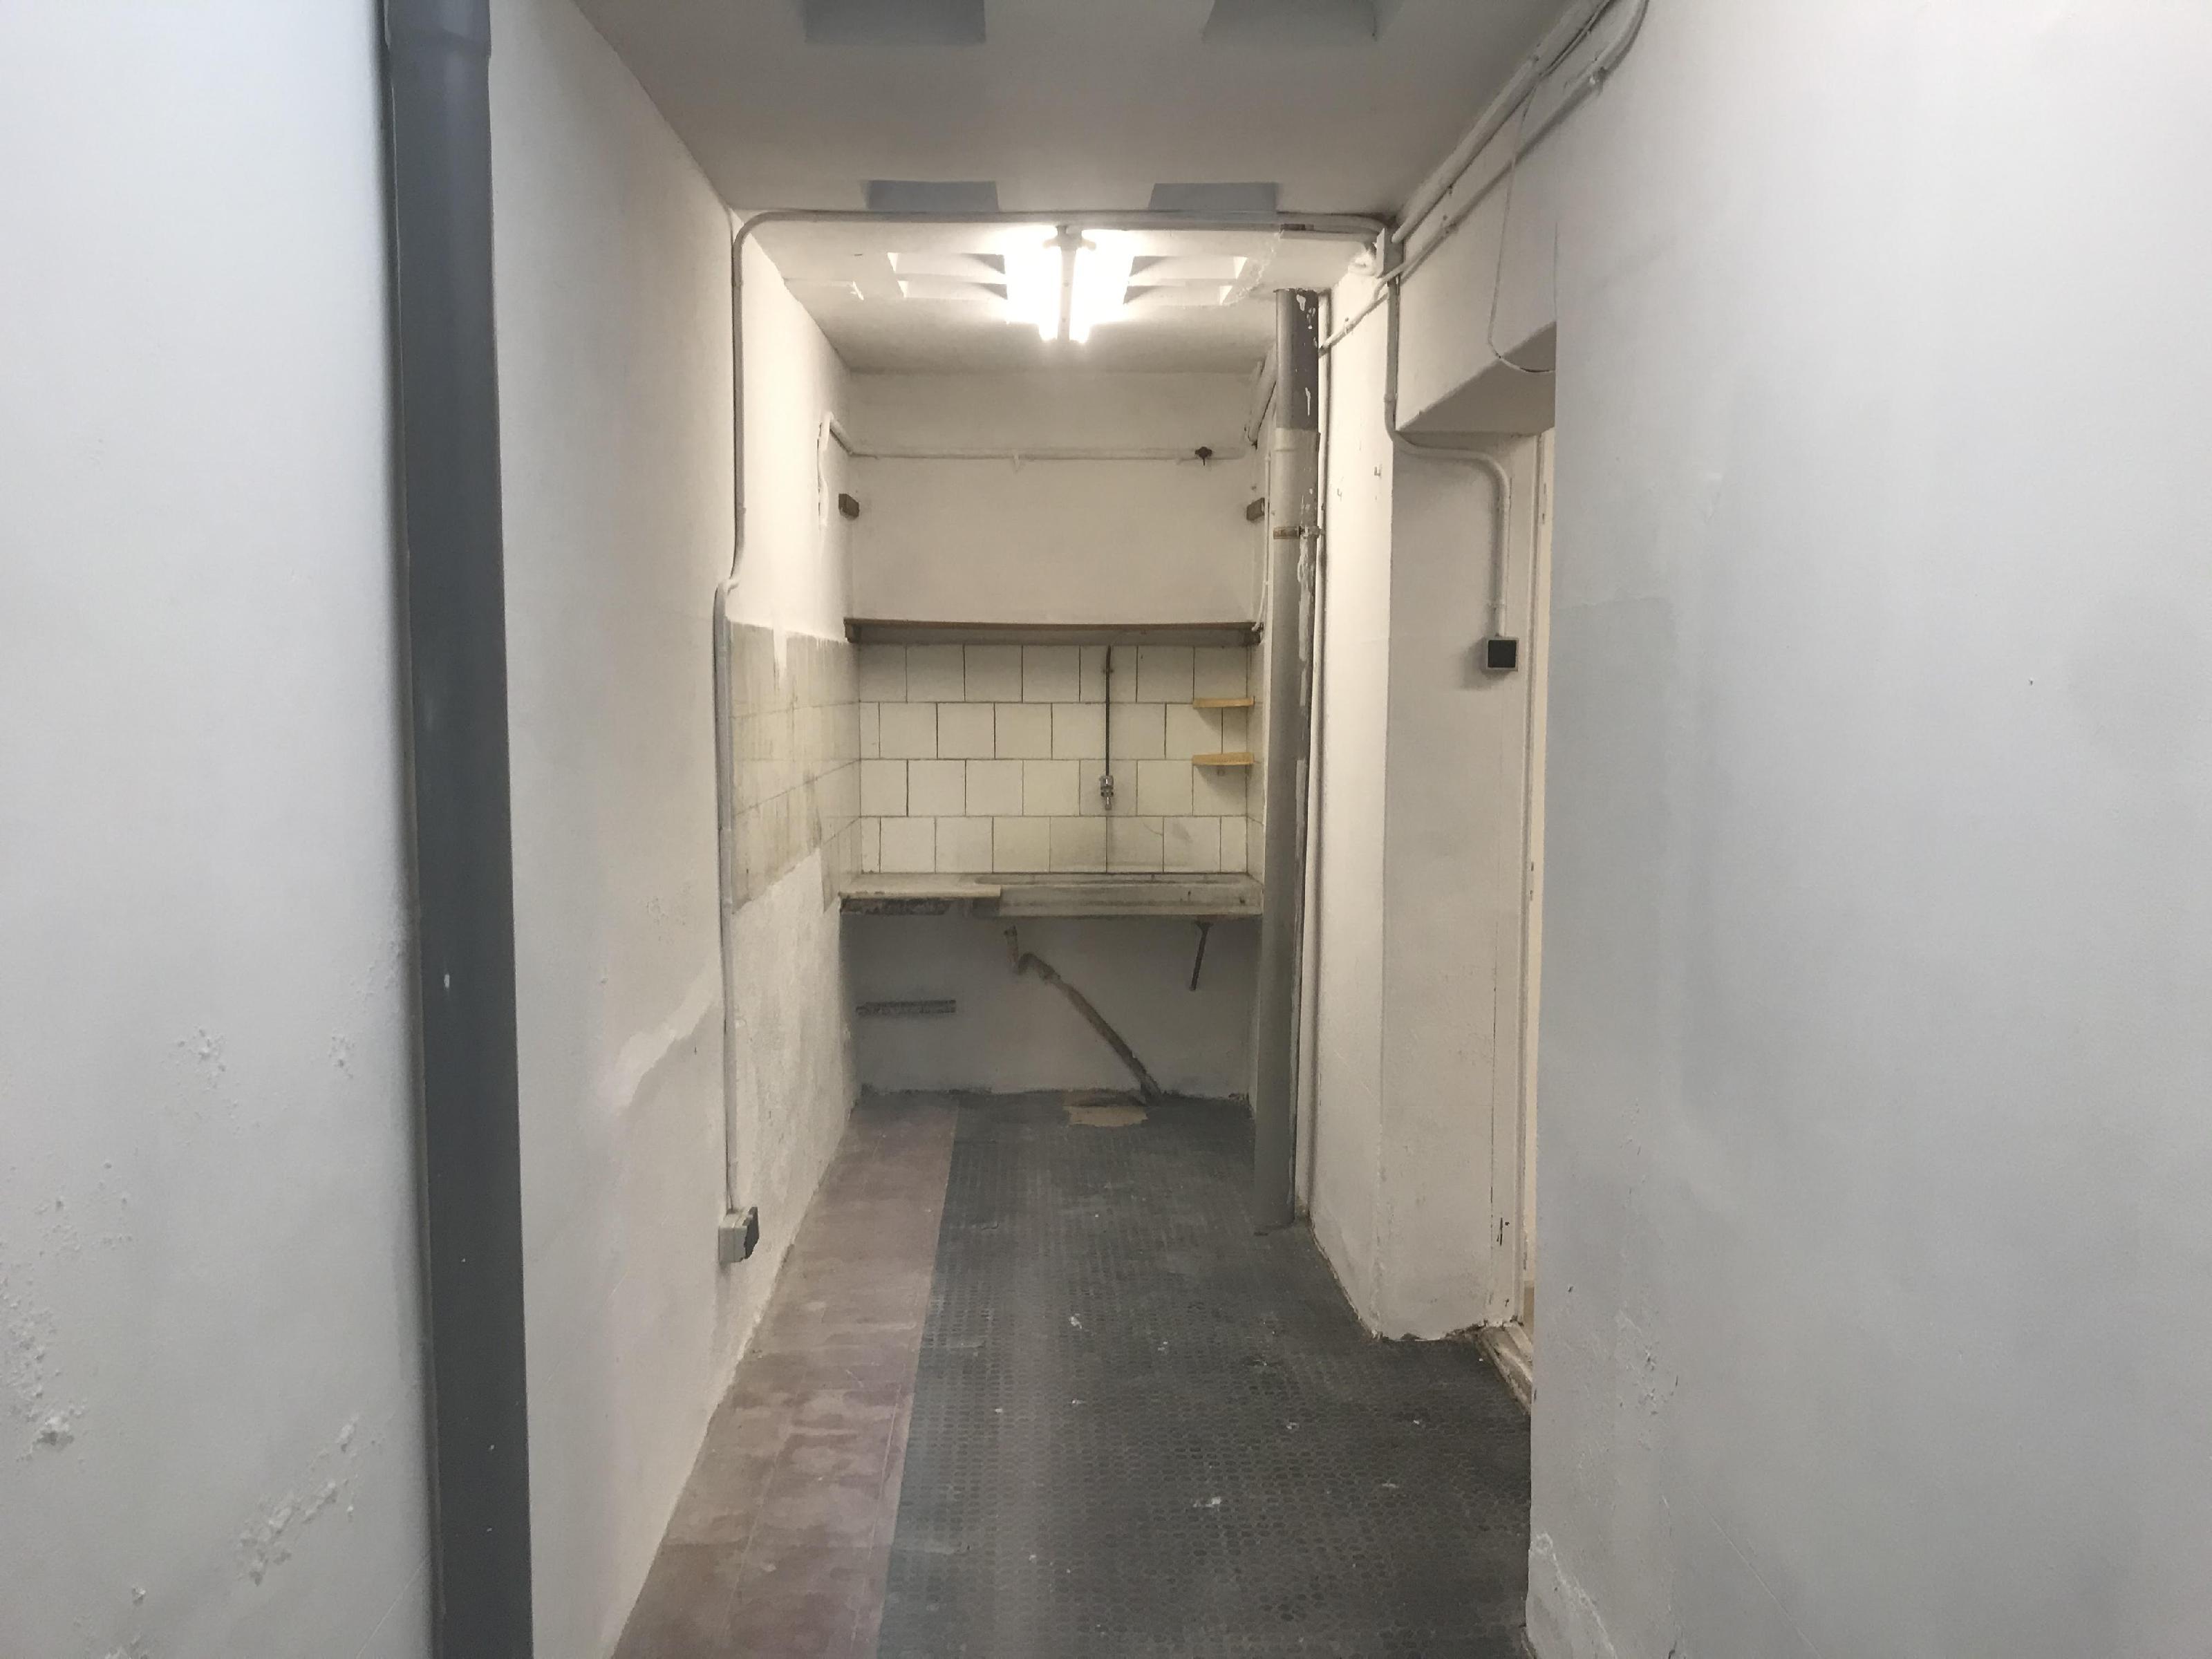 249614 Commercial premises for sale in Sarrià-Sant Gervasi, Sant Gervasi-Galvany 9